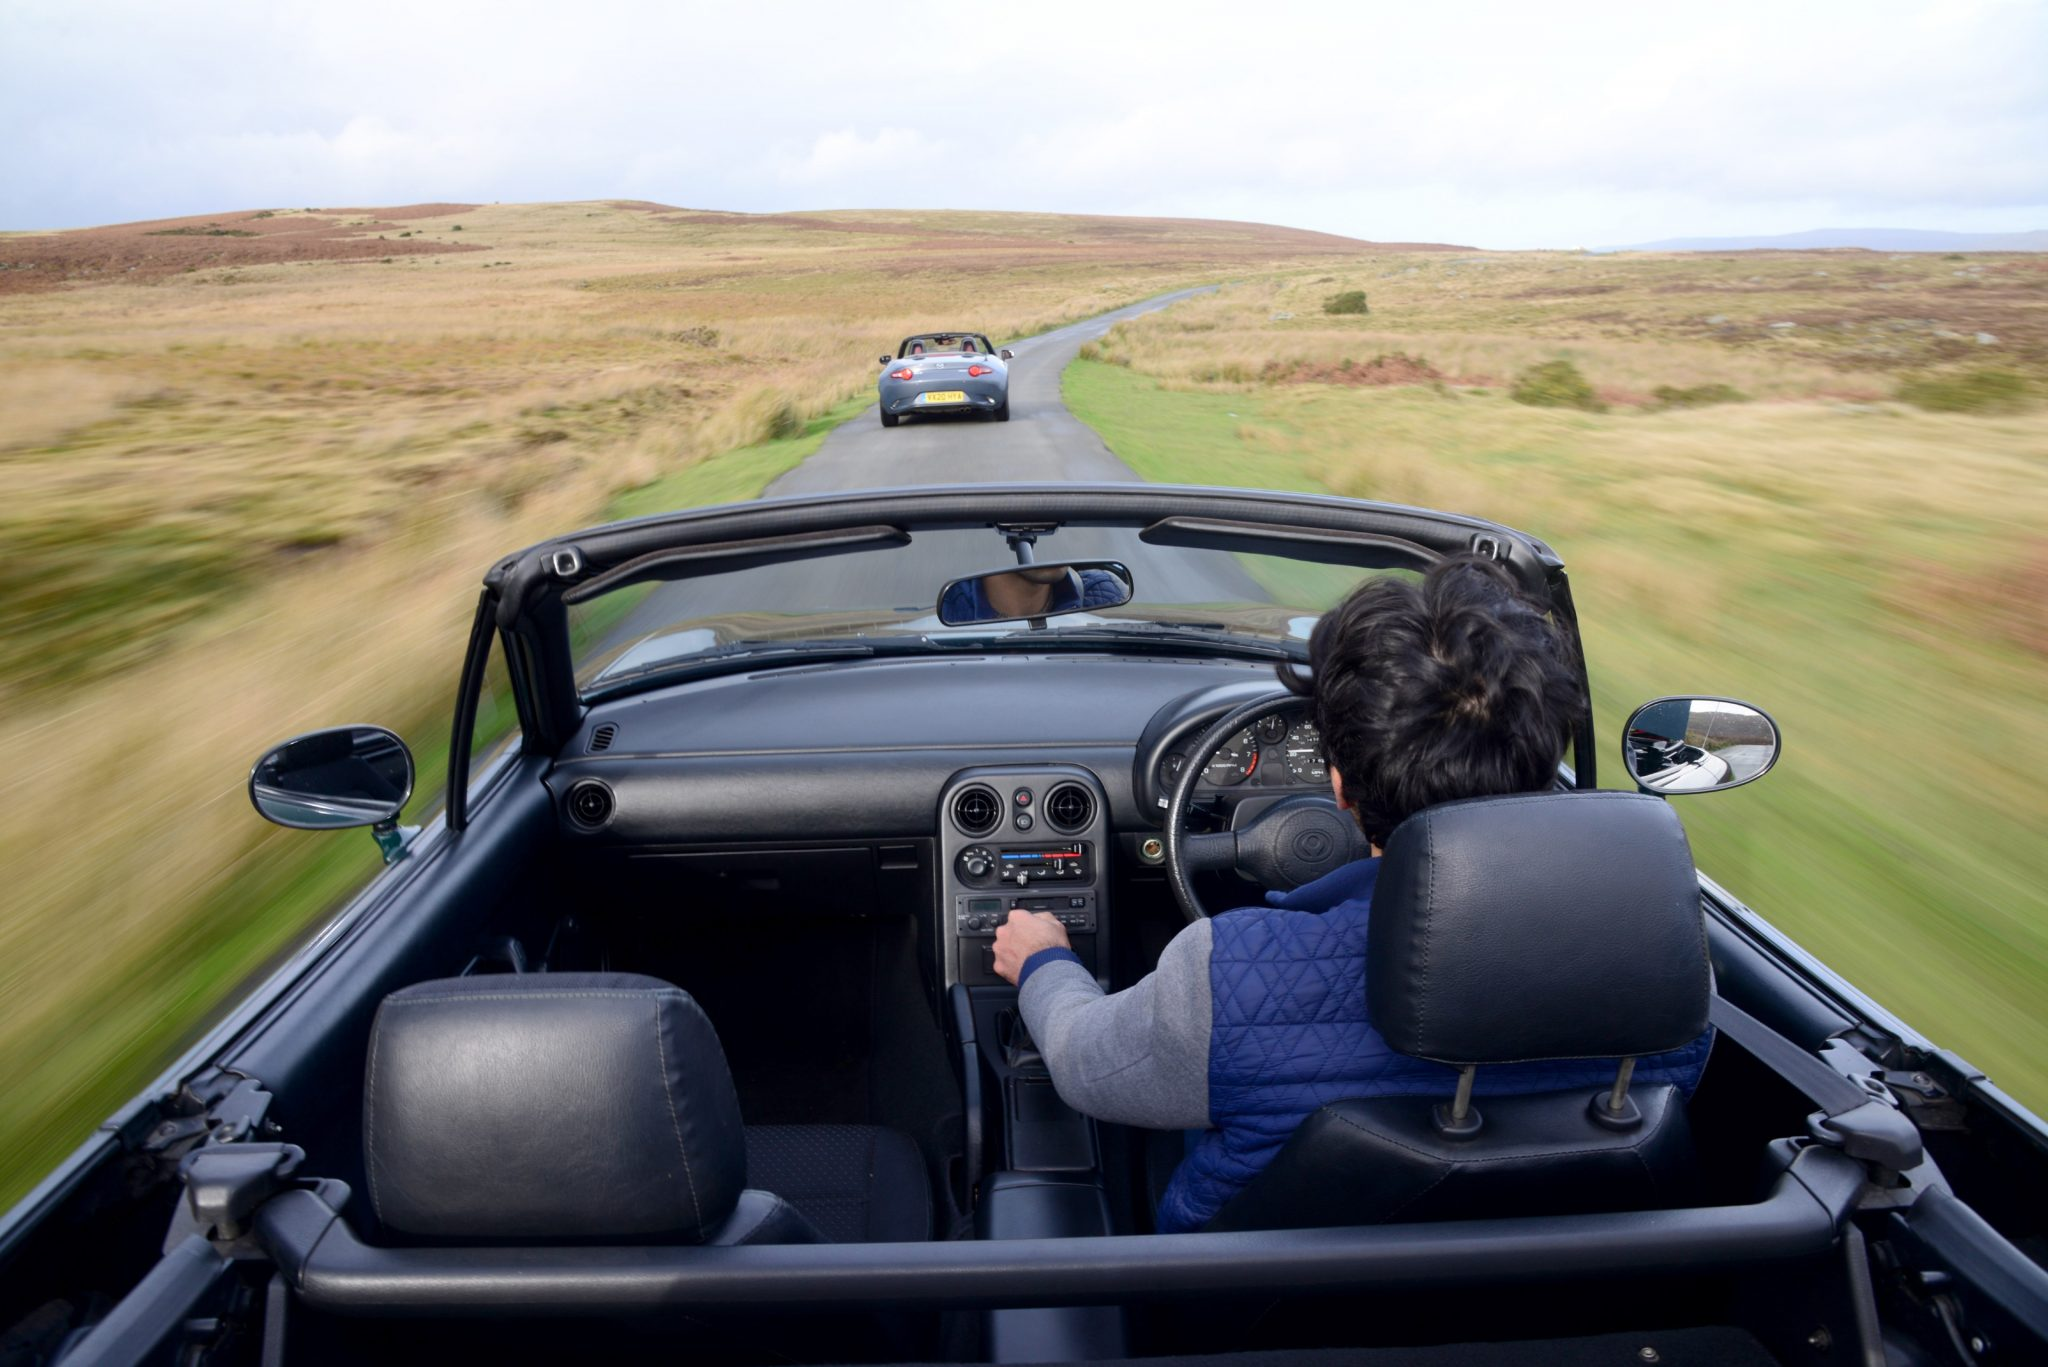 Mazda MX-5 interior driving dynamic action